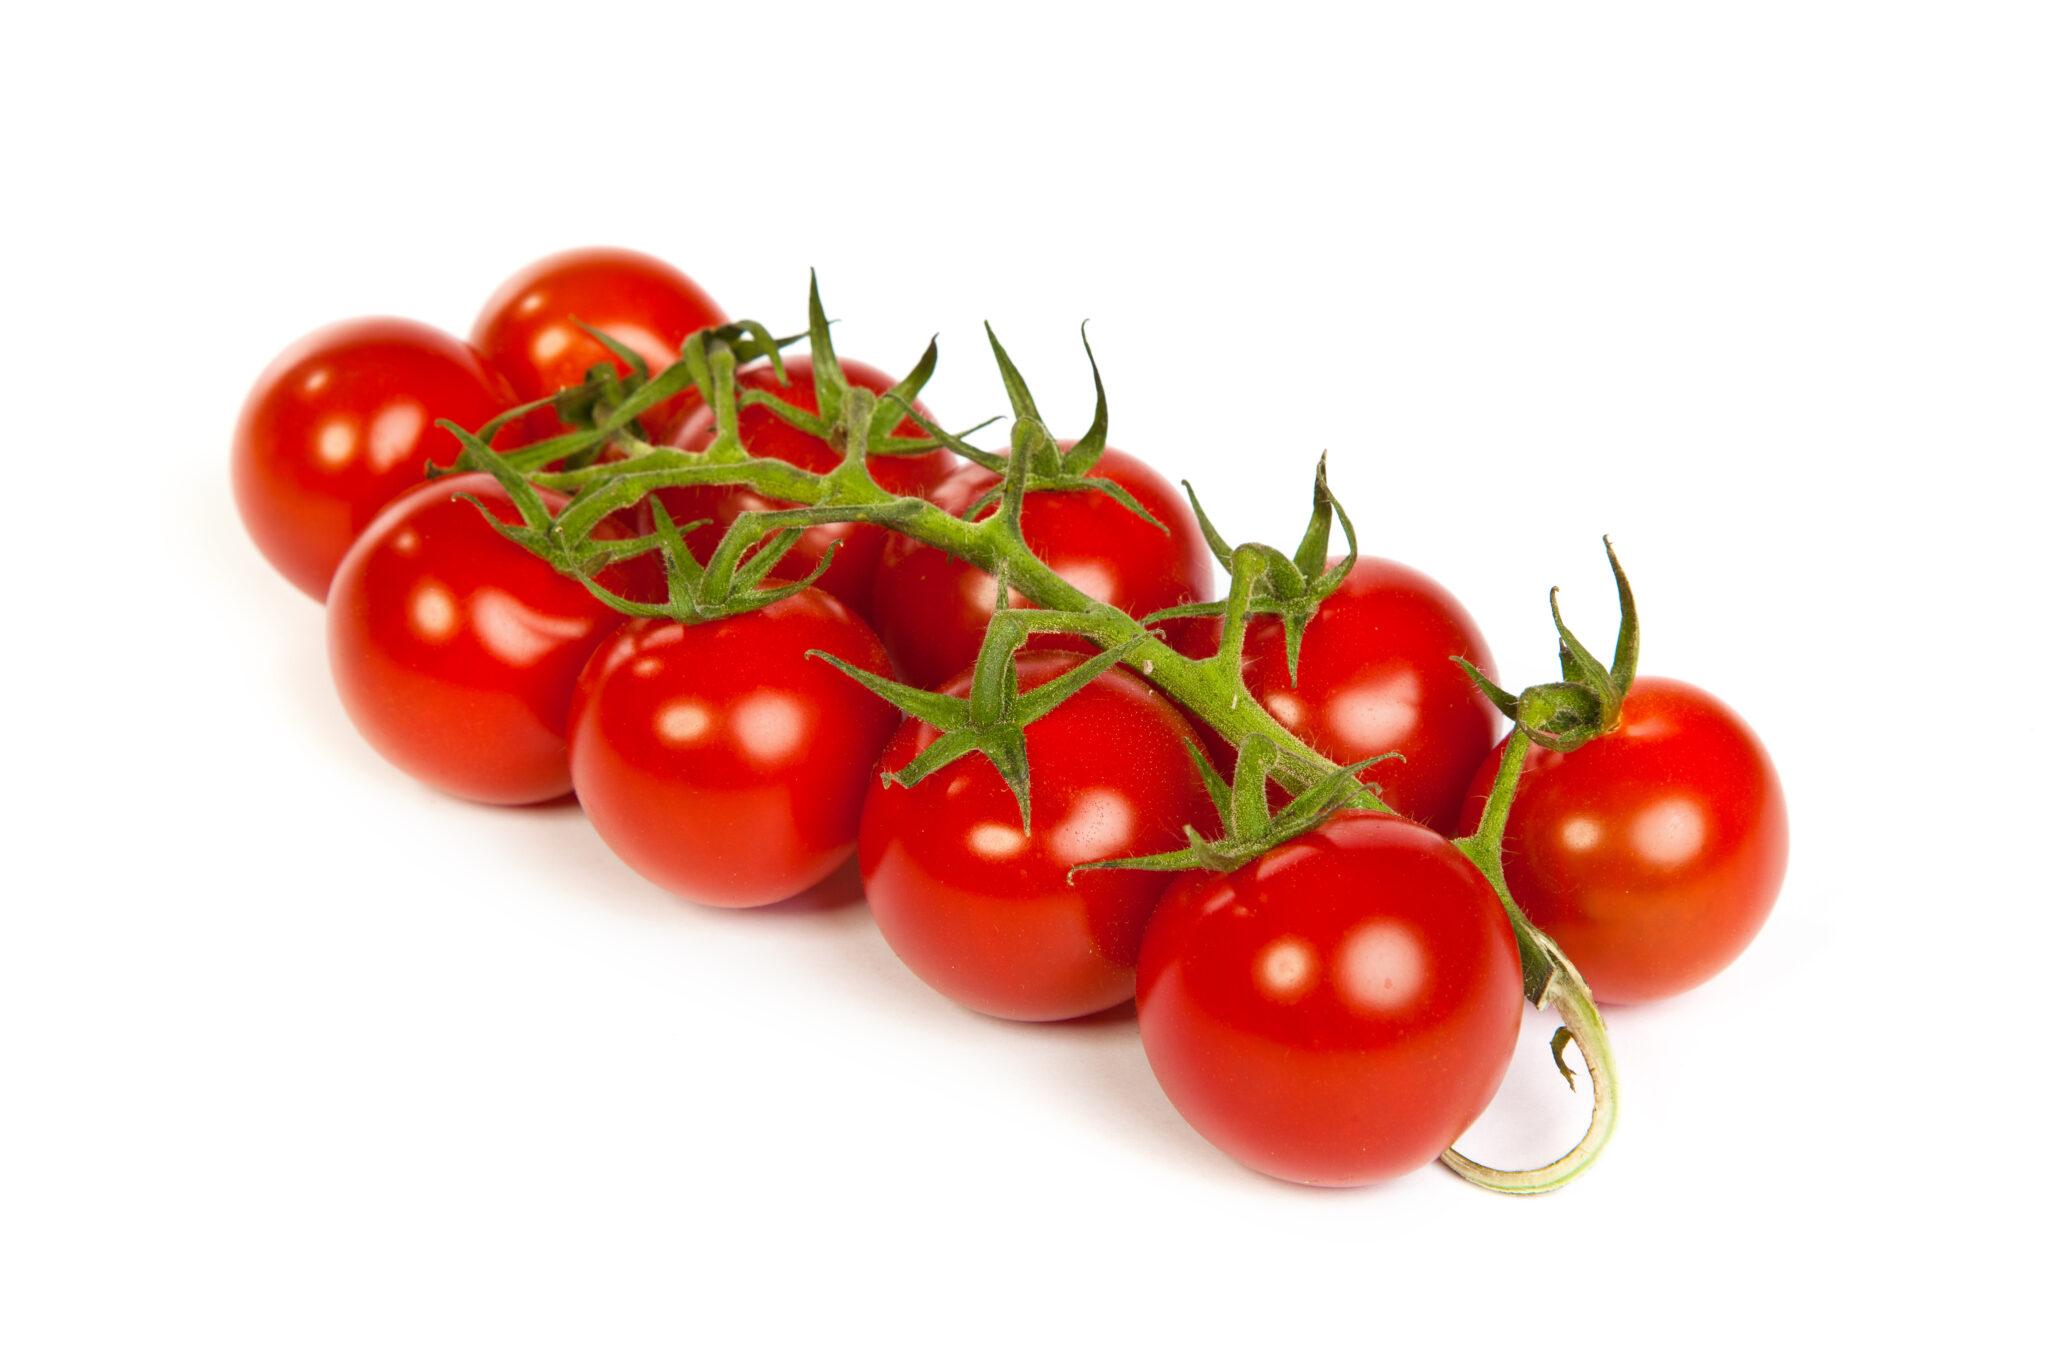 Tomatoes_(copy_2)